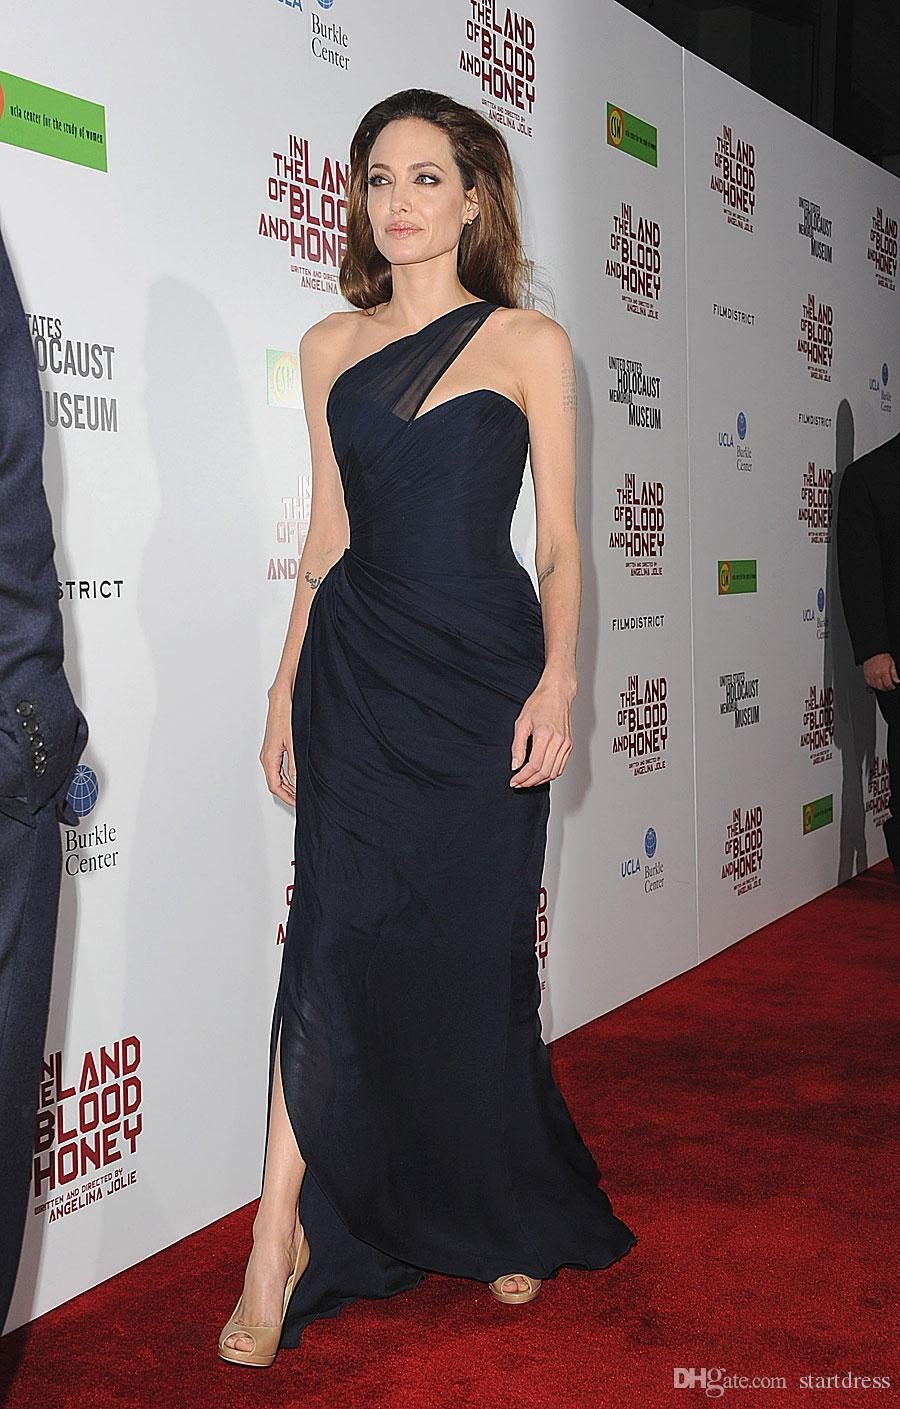 Angelina Jolie Black Navy Chiffon One Shoulder Formal Evening Dresses Pleat Side Slit Floor Length Red Carpet Celebrity Prom Gowns Long 2018